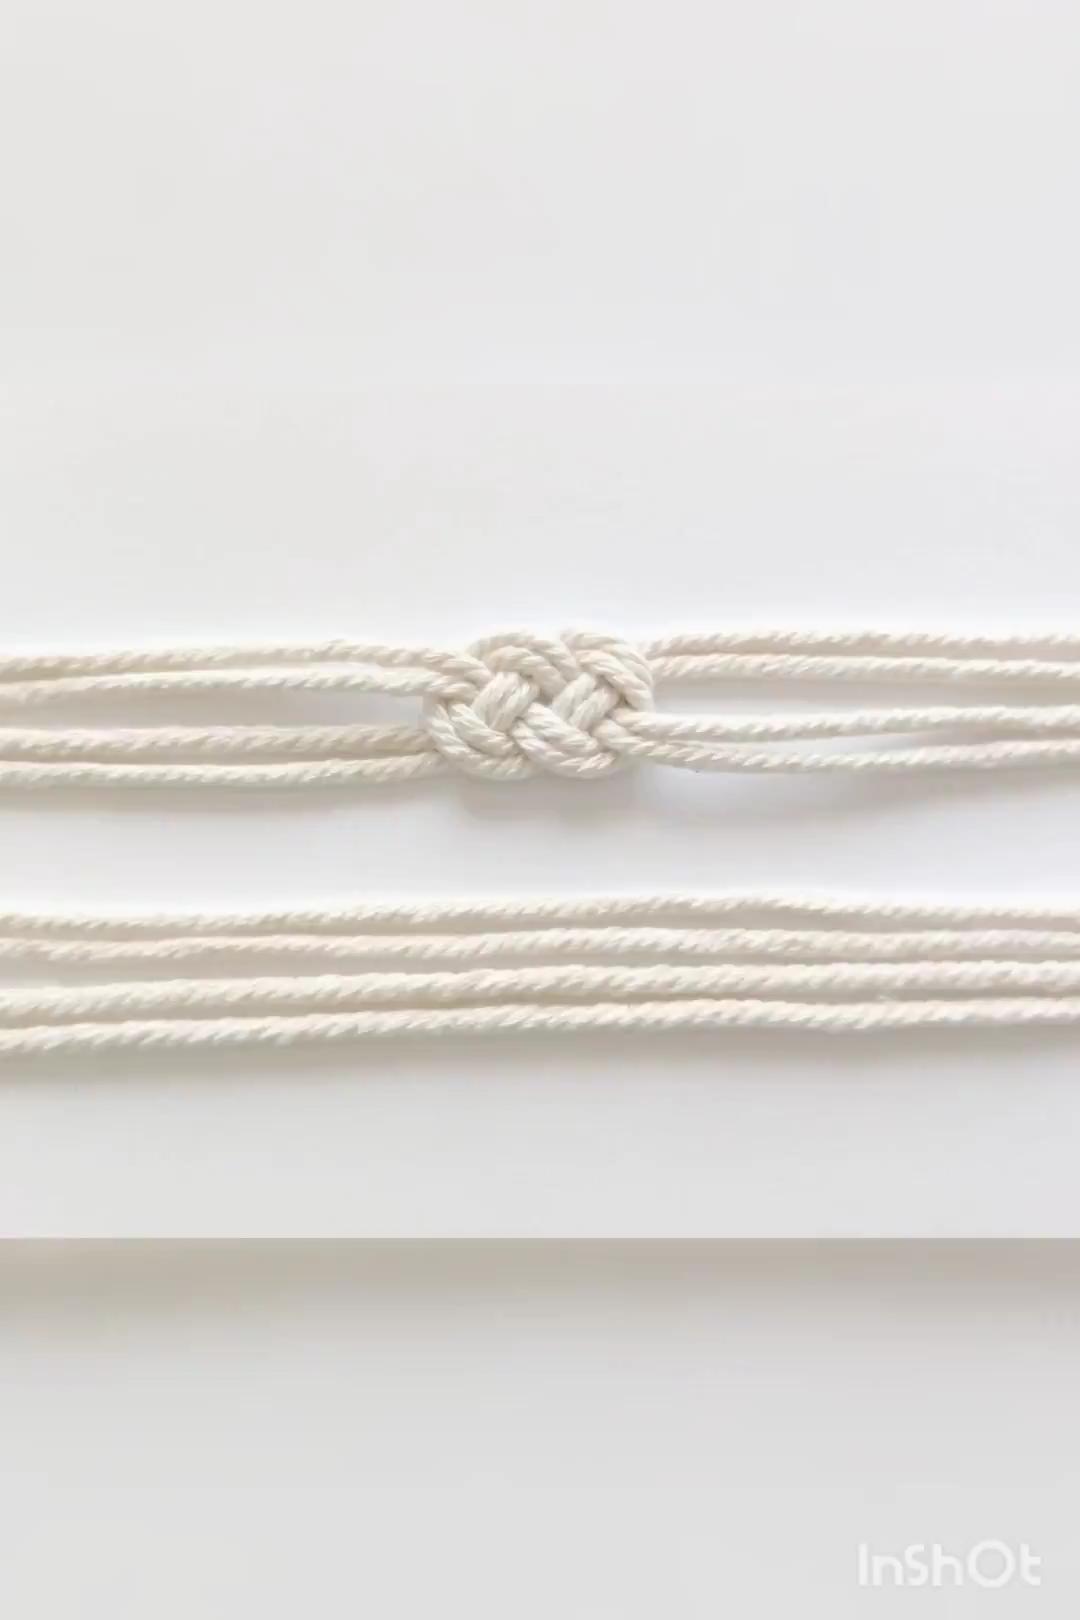 Photo of Josephine knot tutorial